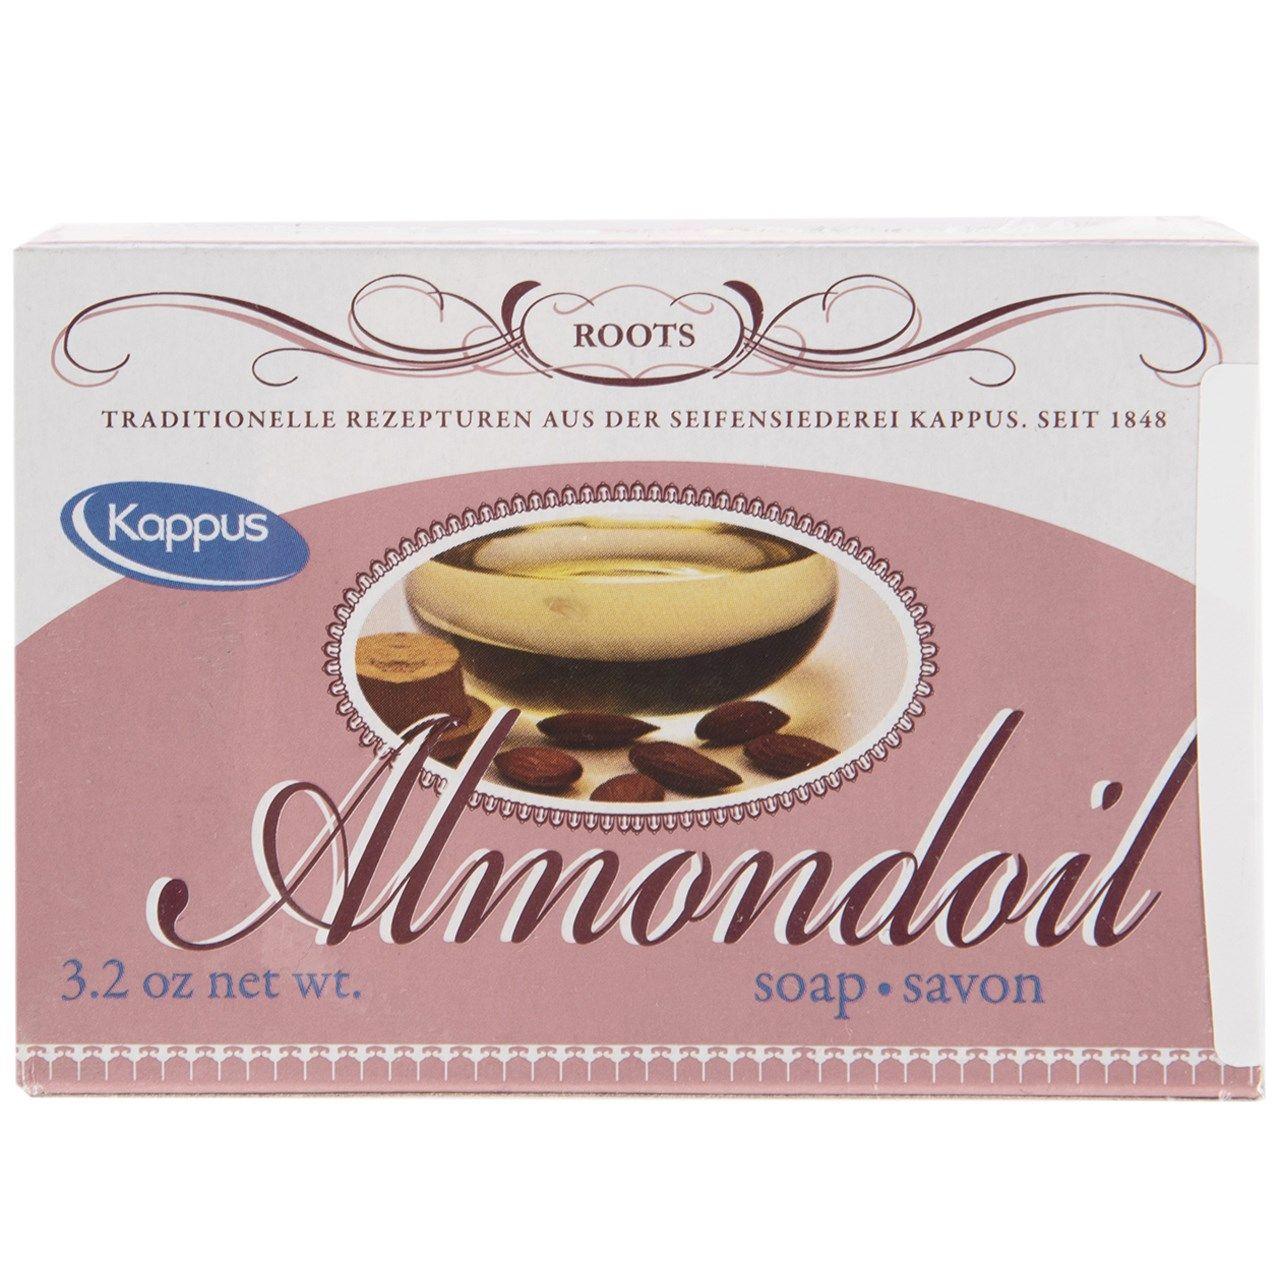 صابون کاپوس مدل Almond Oil مقدار 100 گرم -  - 1